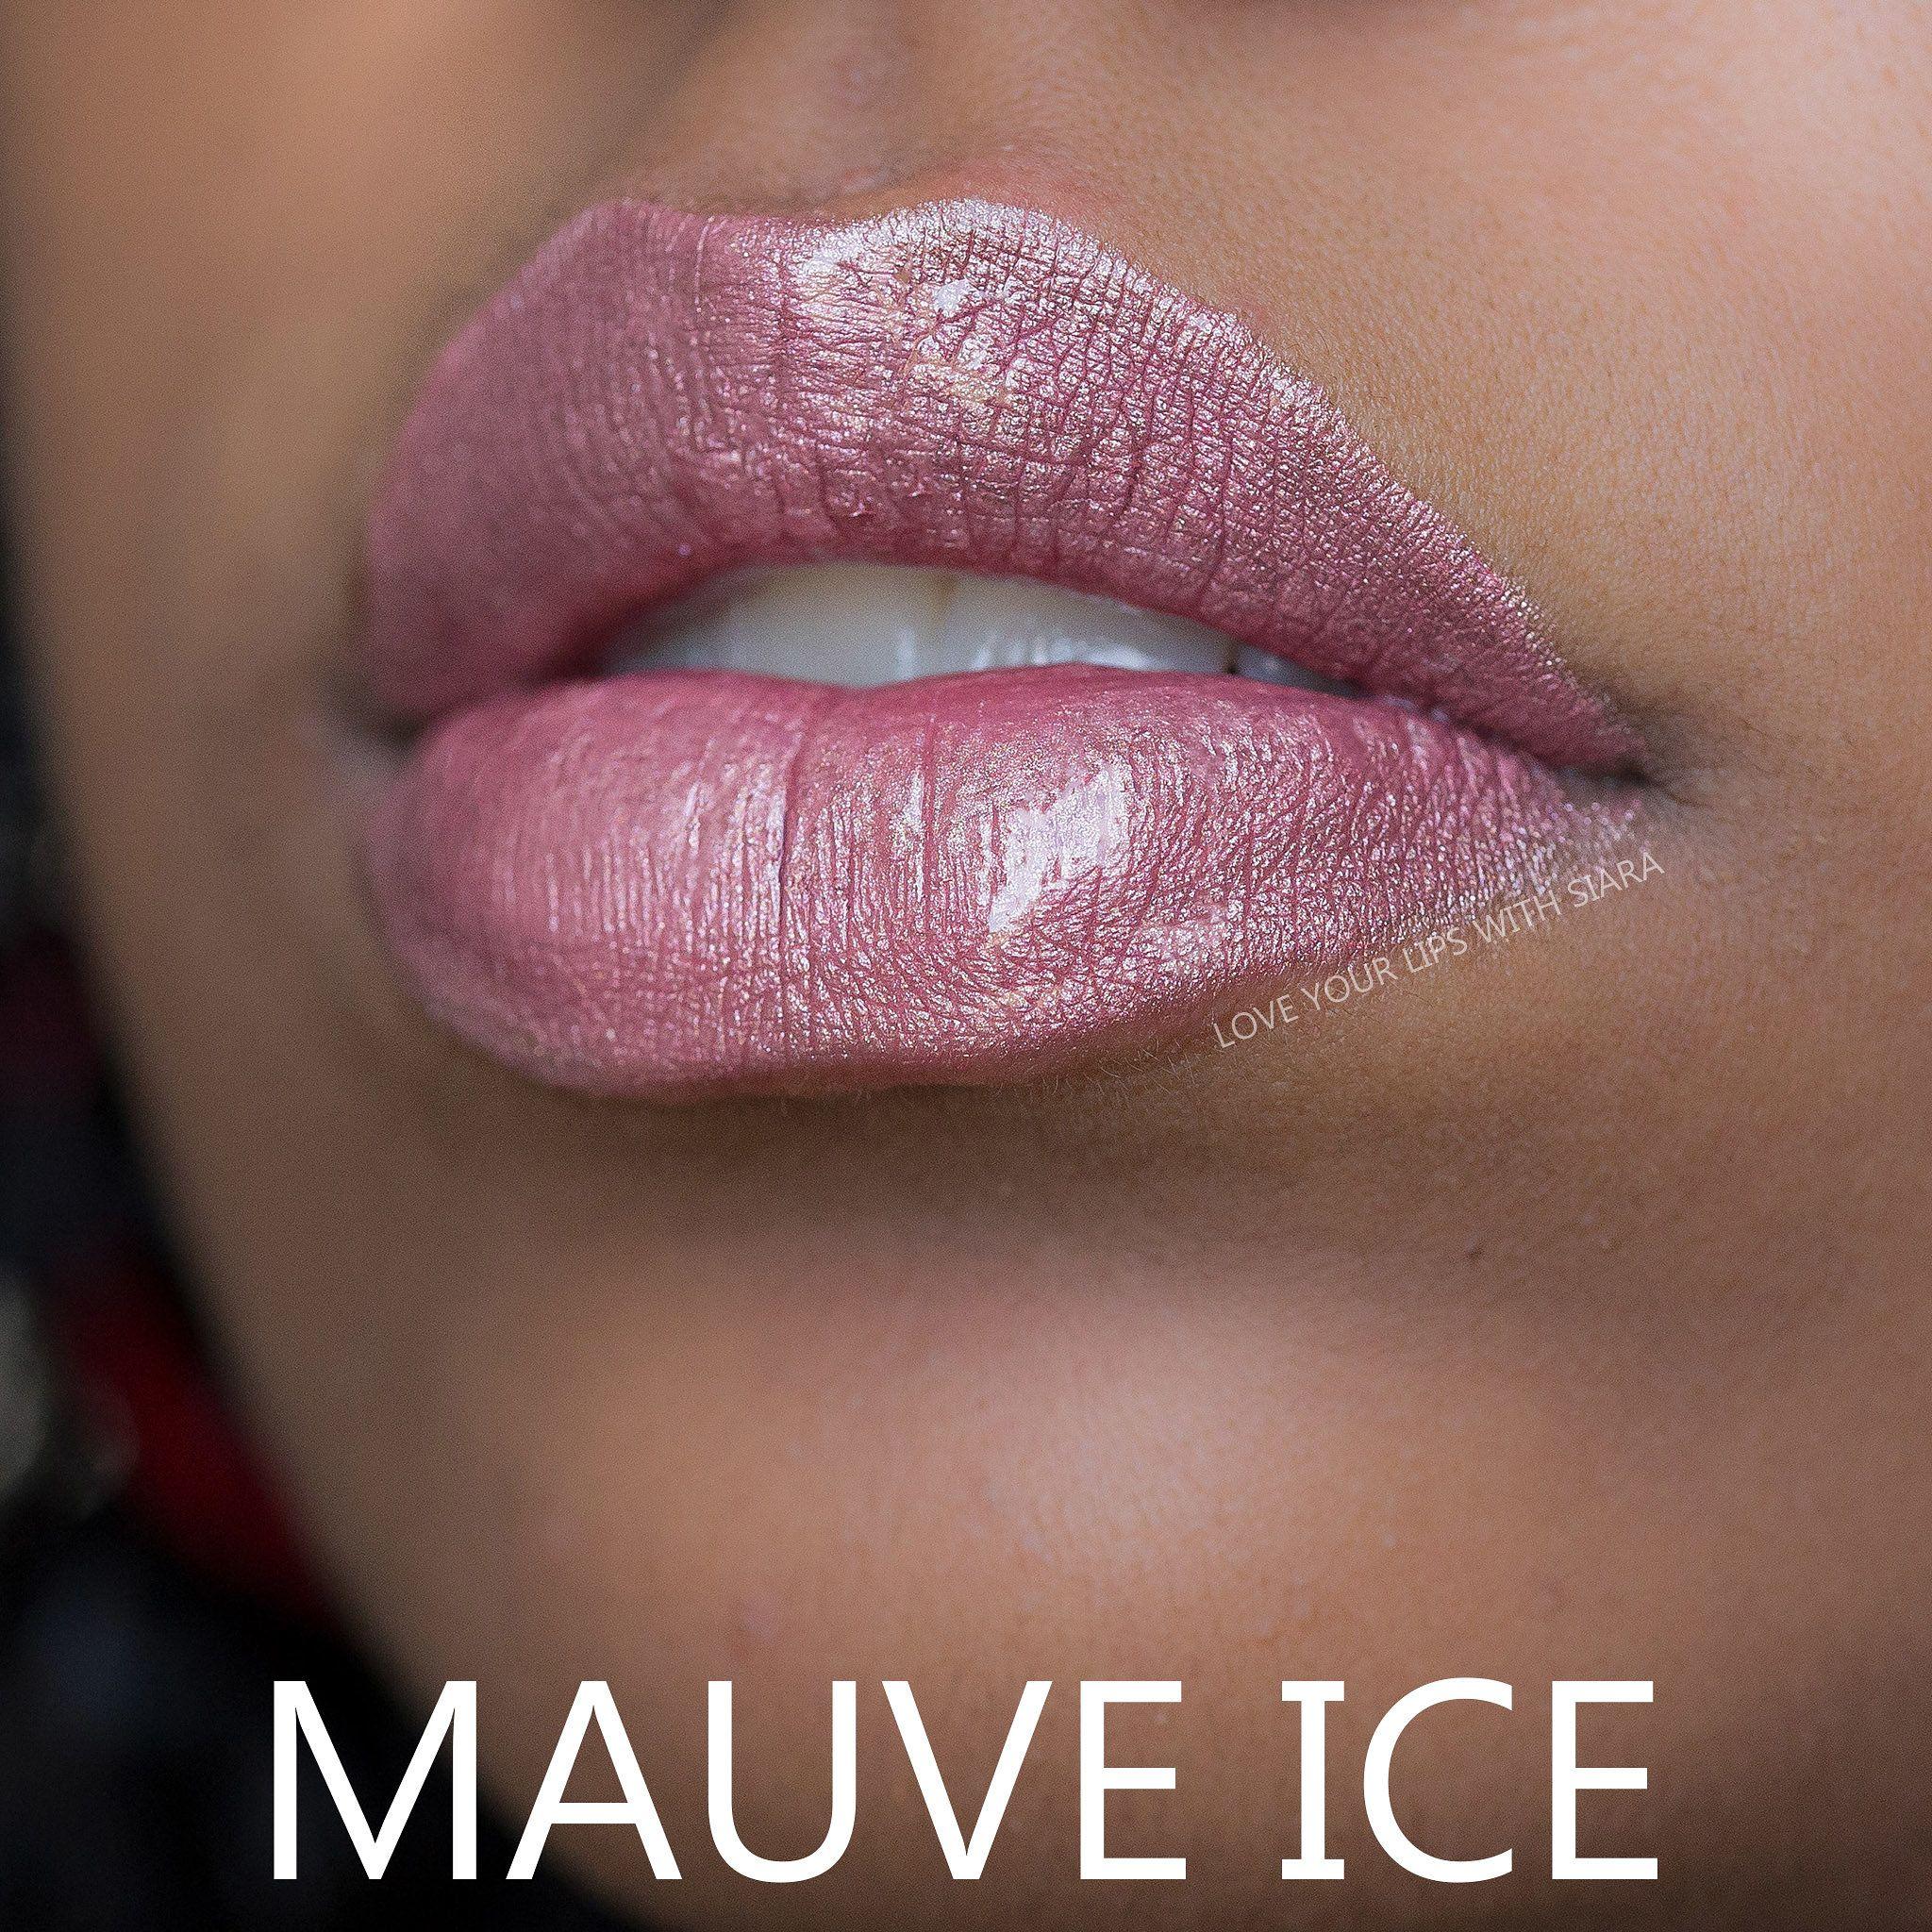 Mauve Ice W Glossy Gloss Long Lasting Lip Color Glossier Gloss